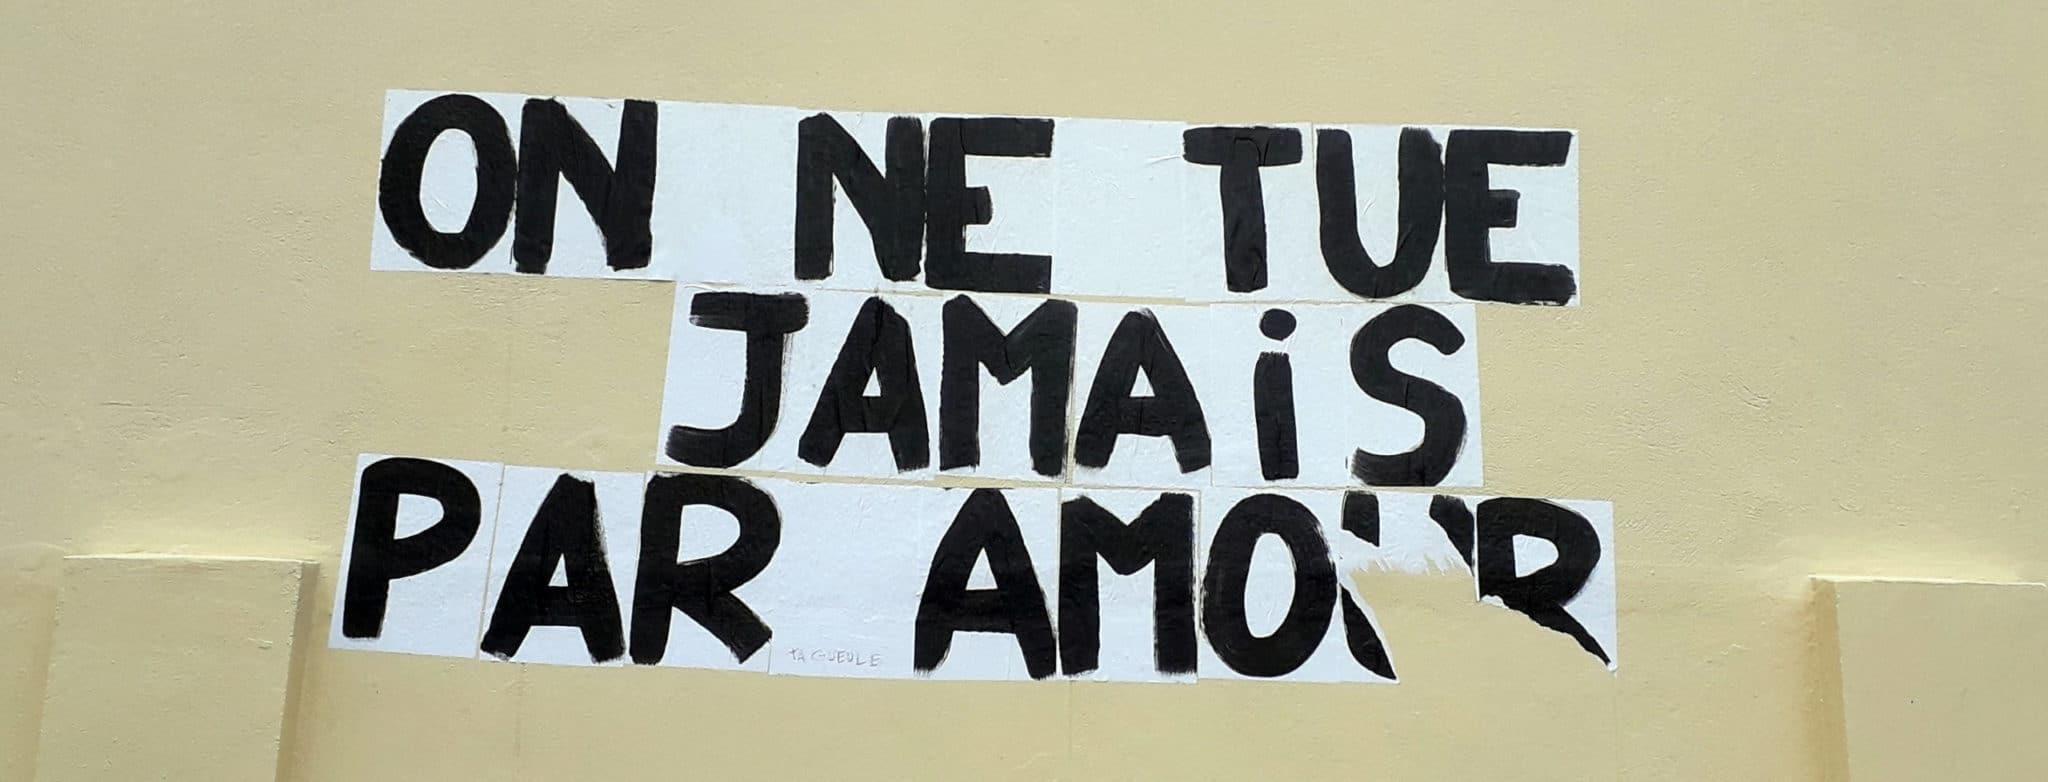 23 novembre 2019 Féminicides, violences sexistes: stop!